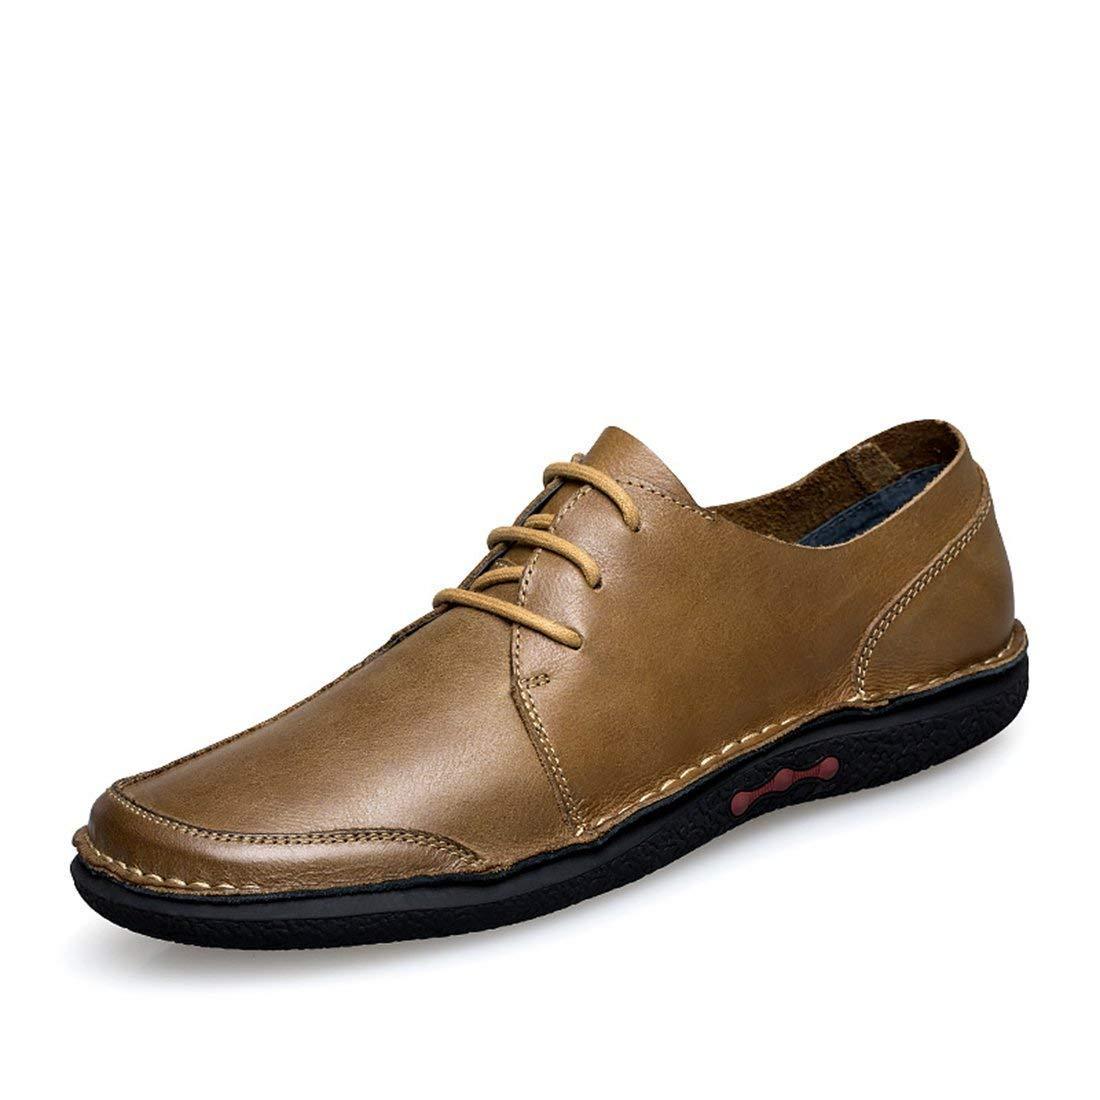 Herren Oxfords-Style Gummisohle Khaki Fashion Turnschuhe UK 5.5 (Farbe   -, Größe   -)